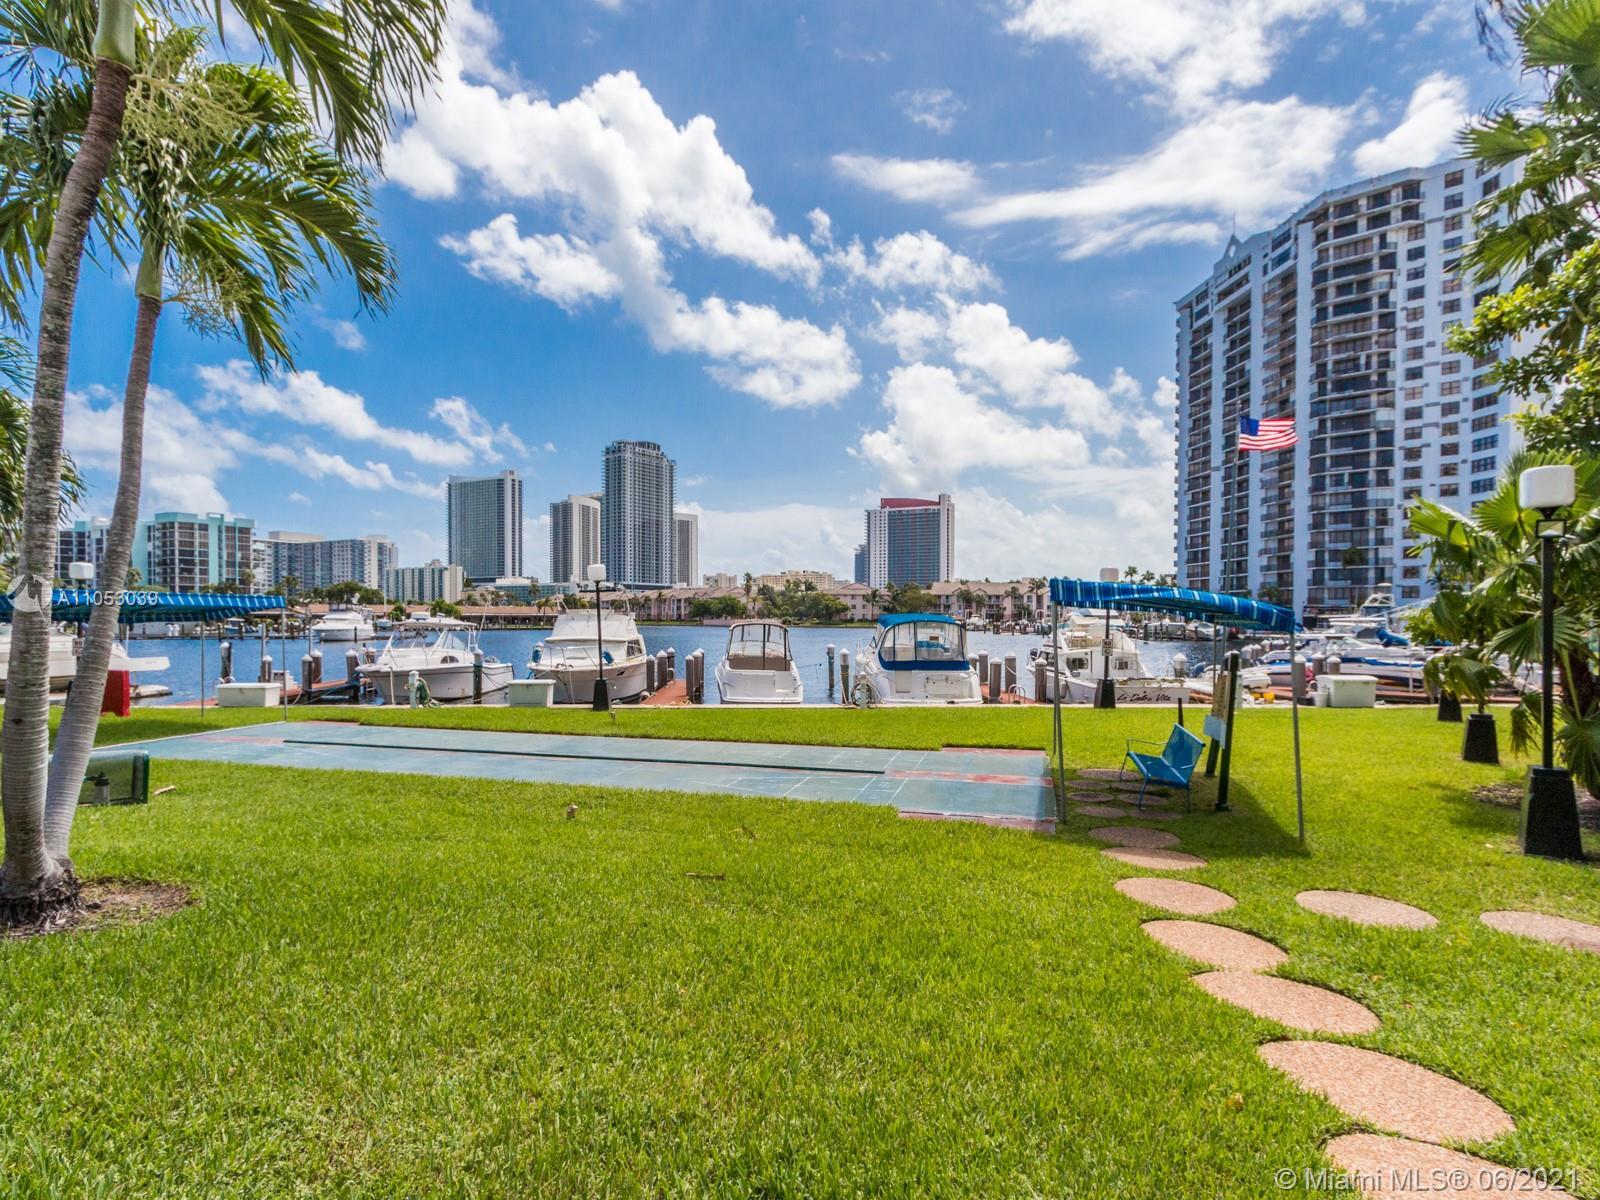 Photo of 600 Three Islands Blvd #312, Hallandale Beach, Florida, 33009 - TENNIS COURT